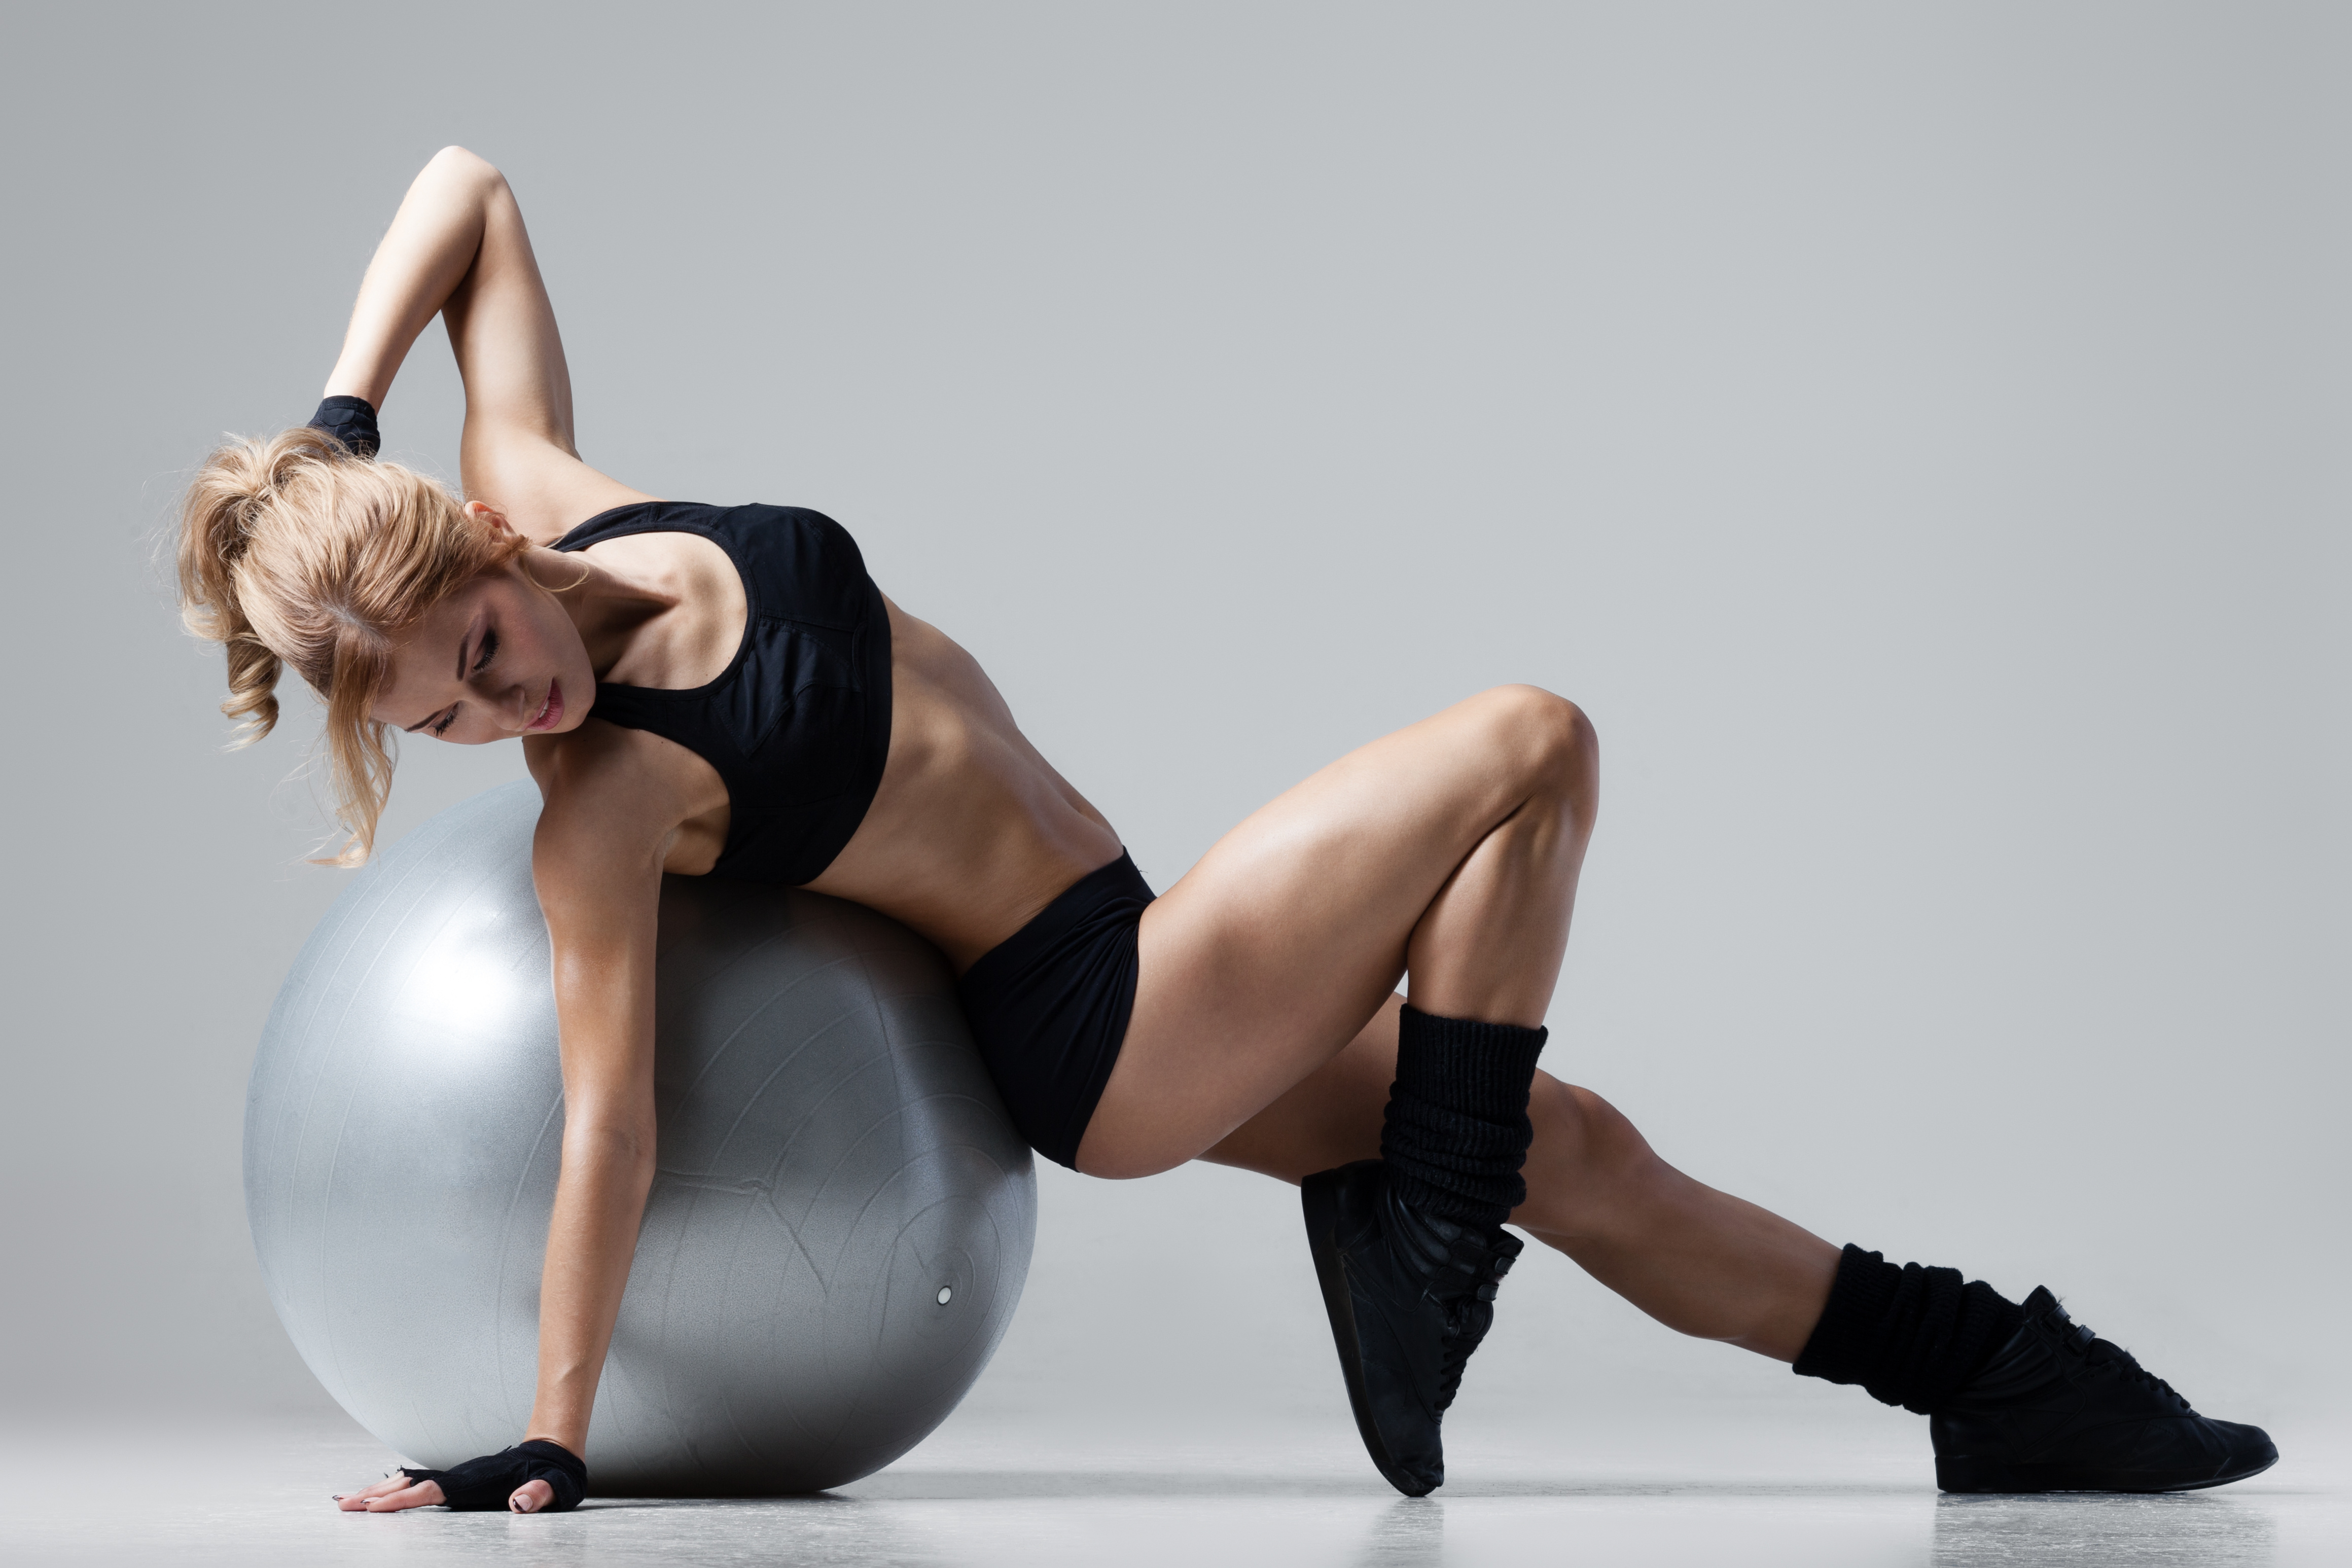 картинки фитнес: